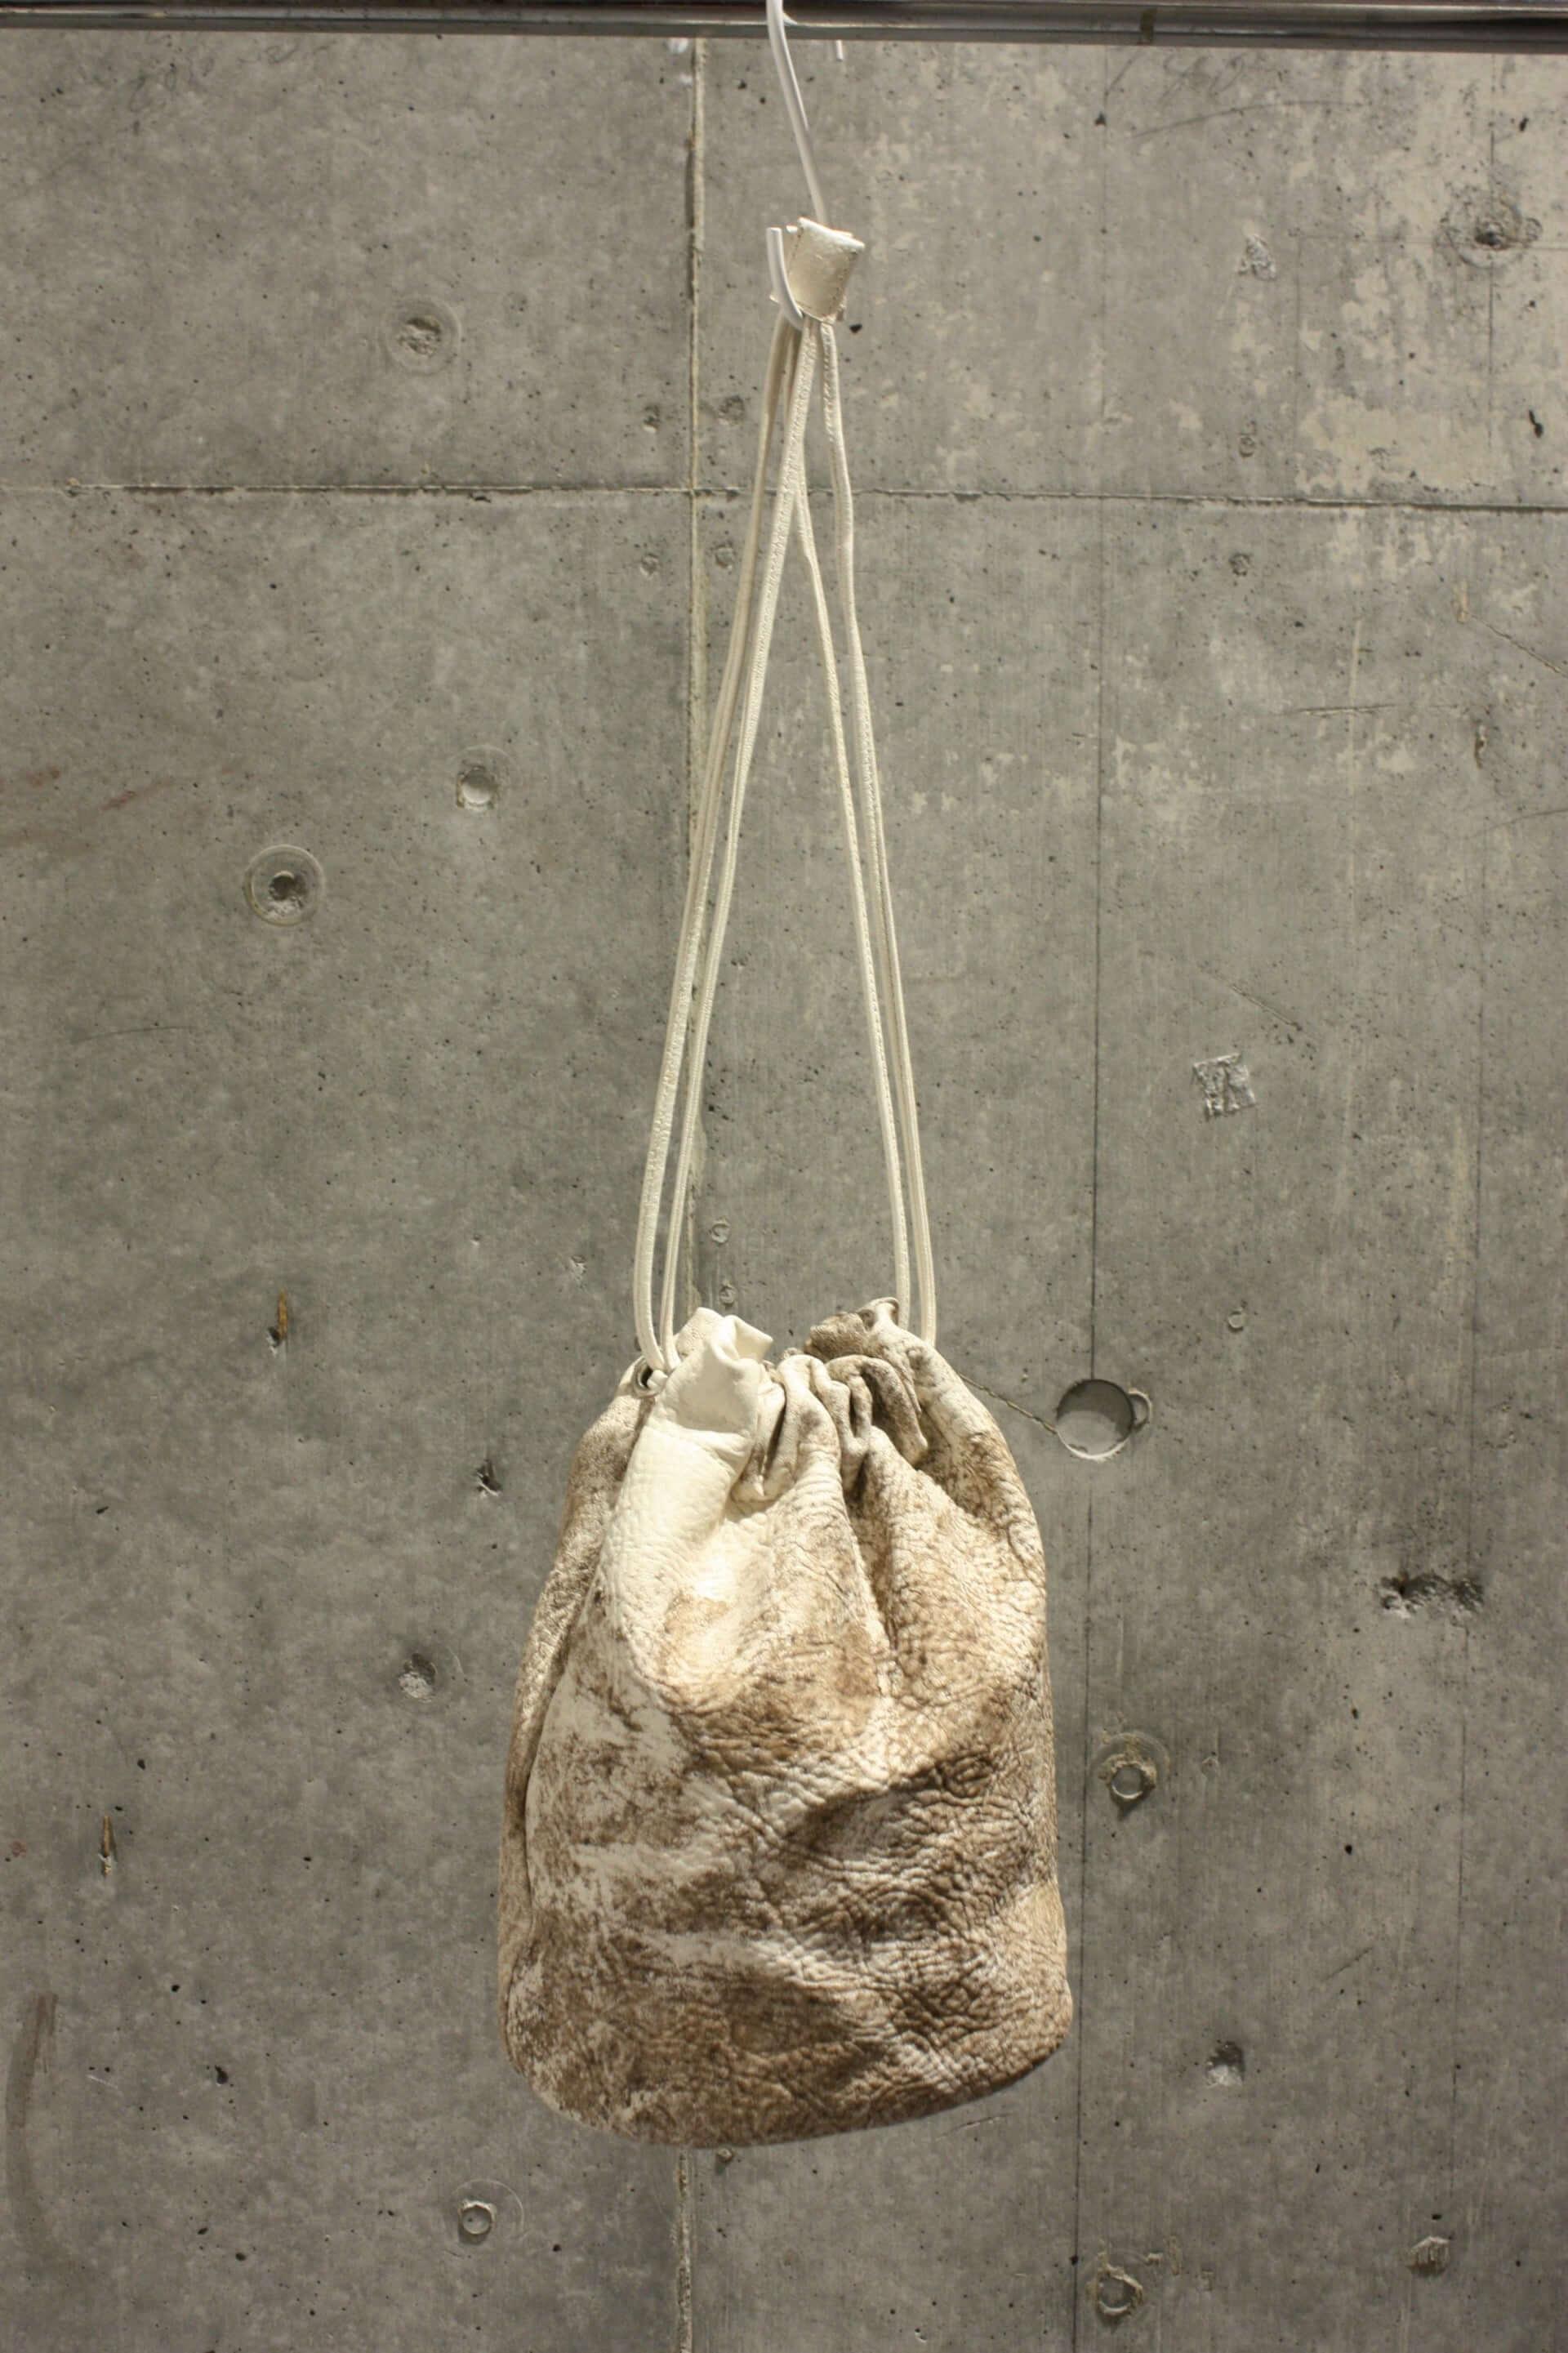 Oriens JOURNAL STANDARD×BRETONの別注バッグが発売決定|アルゼンチン産馬革を使用した唯一無二のデザイン life200608_oriens_journalstandard_3-1920x2881